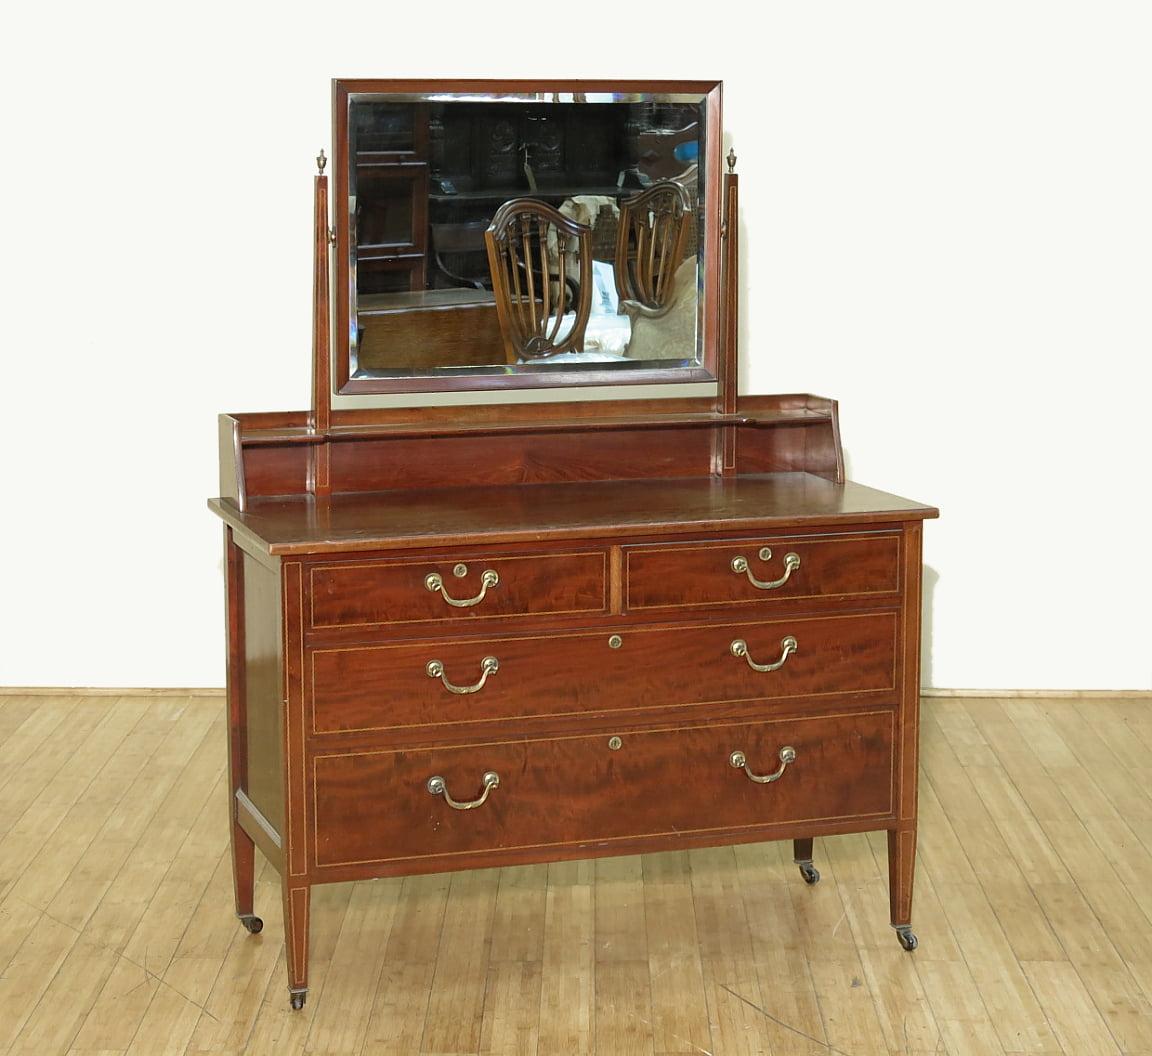 c1950 Antique English Flame Mahogany Vanity Chest Dresser...